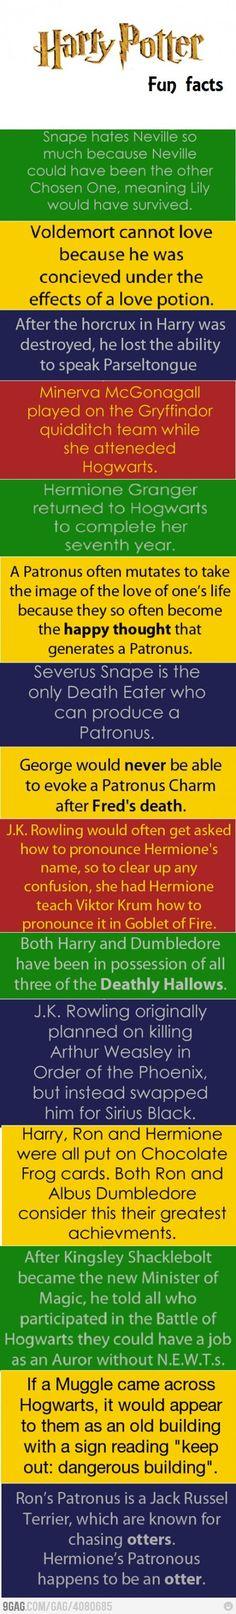 Harry Potter fun facts @Staci Spencer-Hoyt